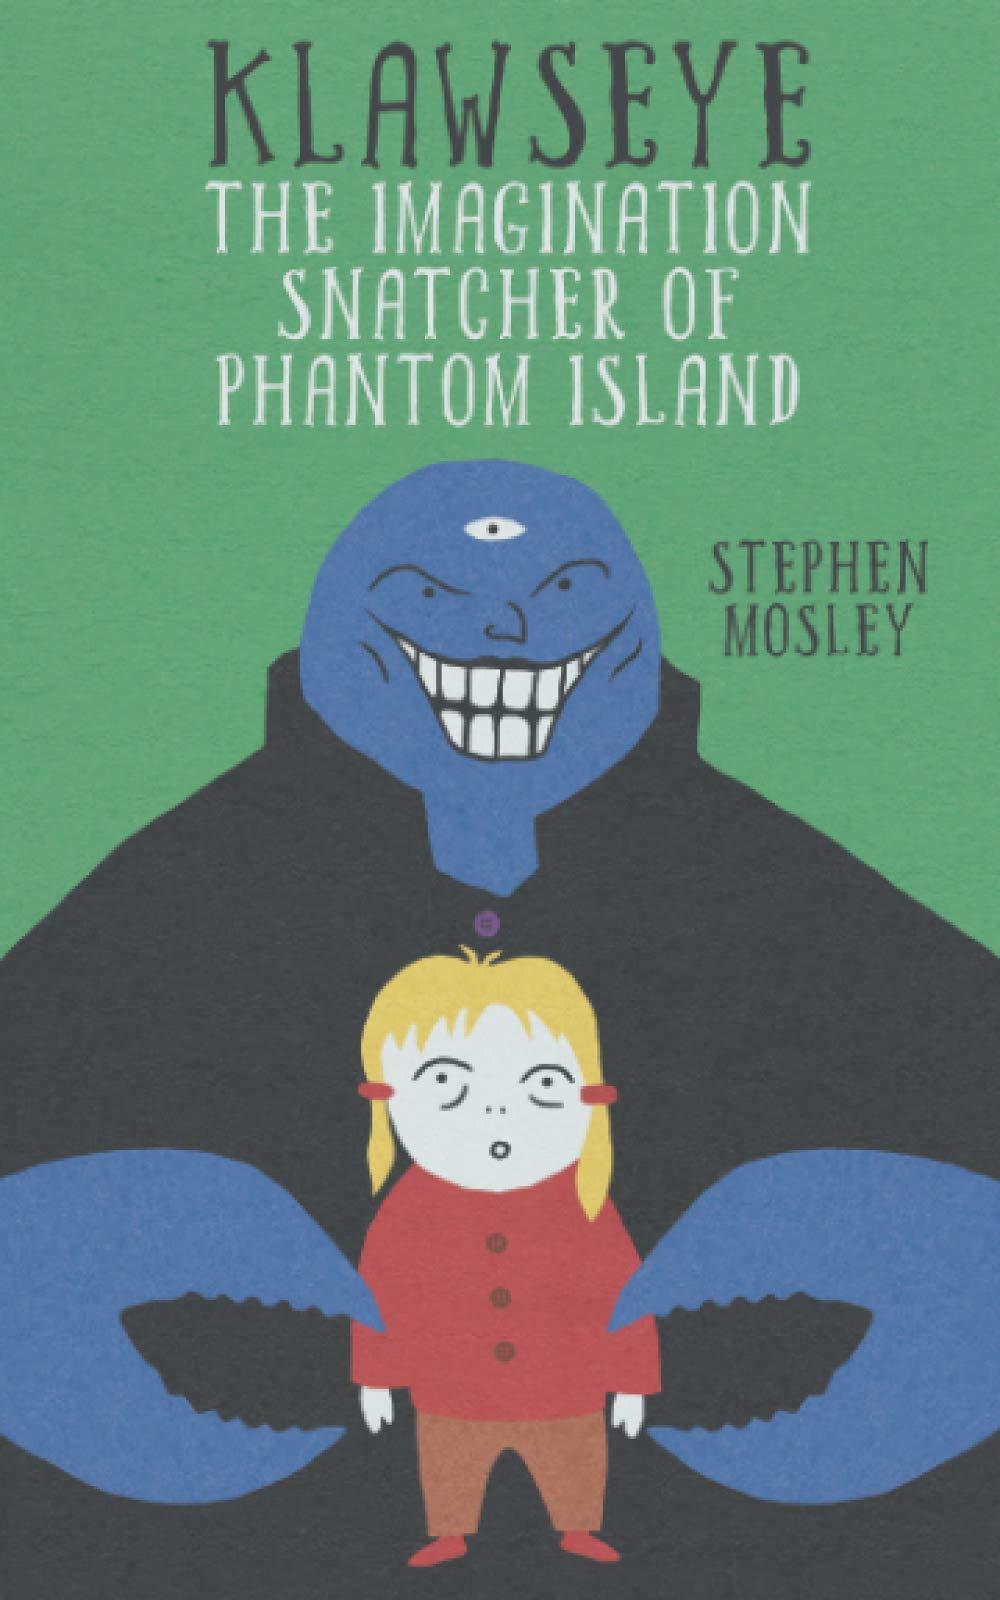 Klawseye: The Imagination Snatcher of Phantom Island by Stephen Mosley